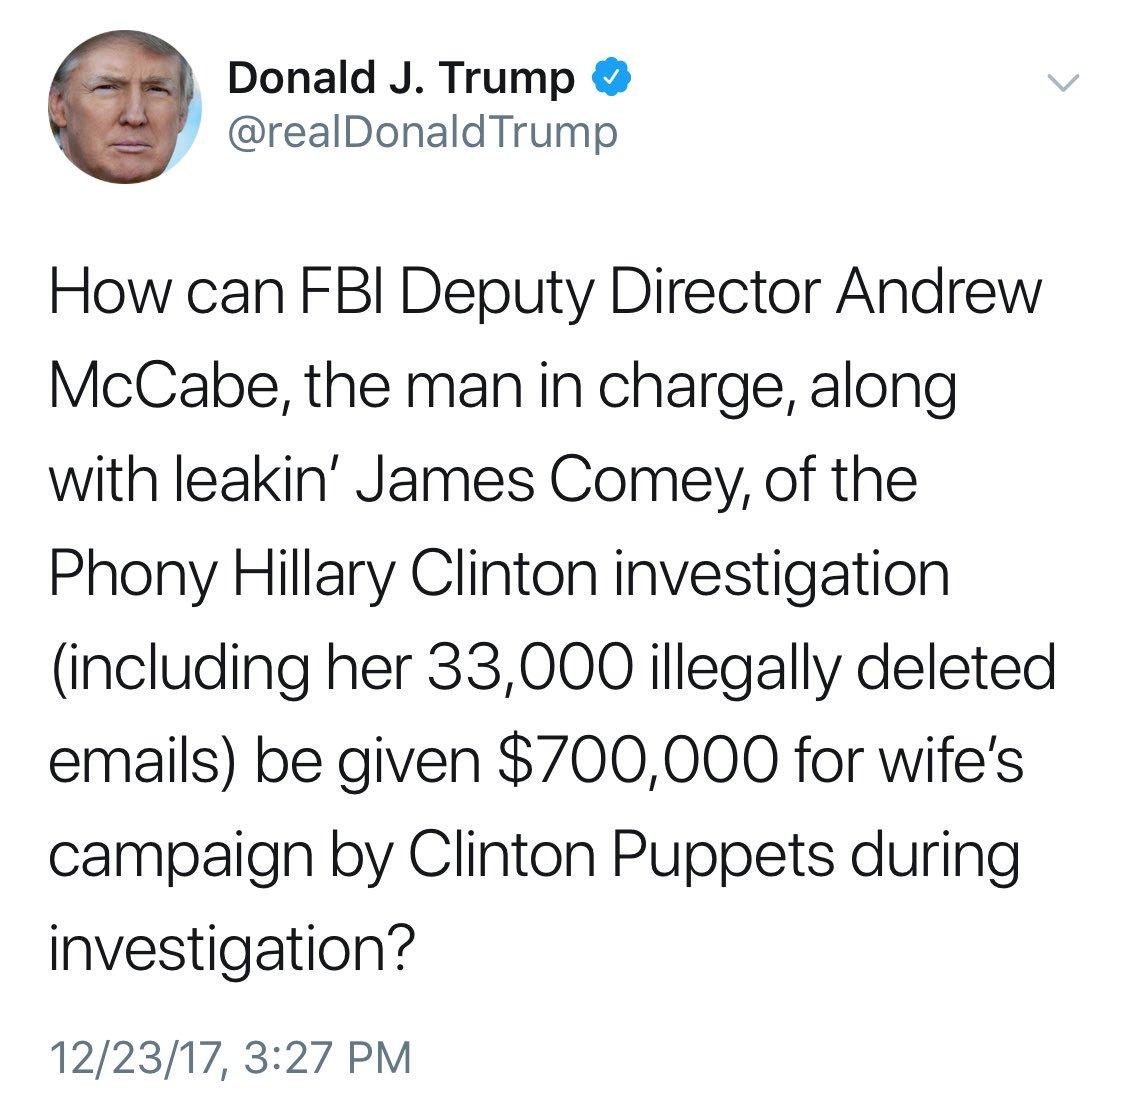 President trash-talking his own FBI deputy director https://t.co/VlXC7U7vKJ